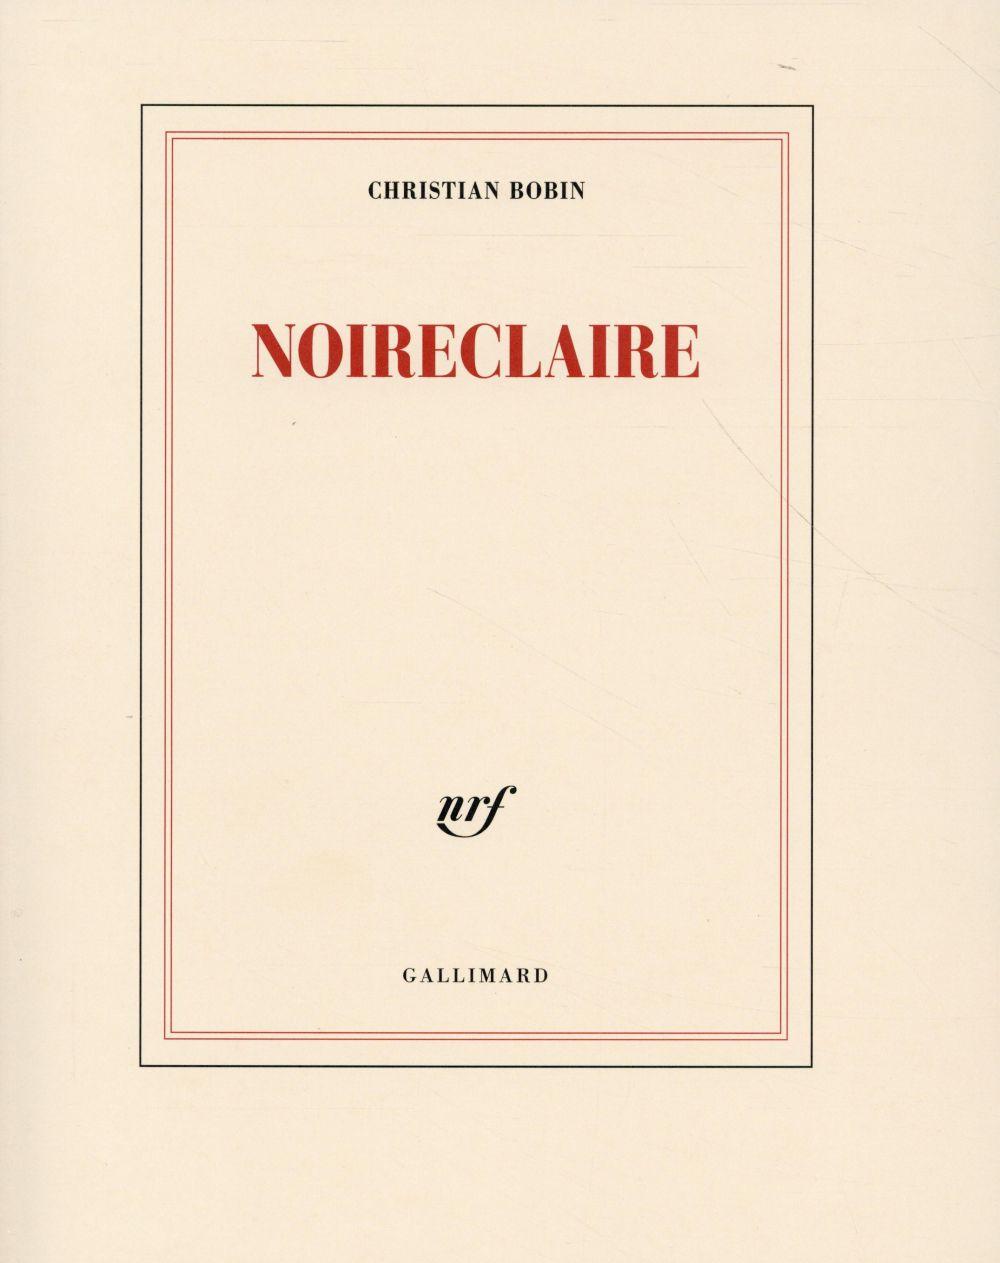 Noireclaire